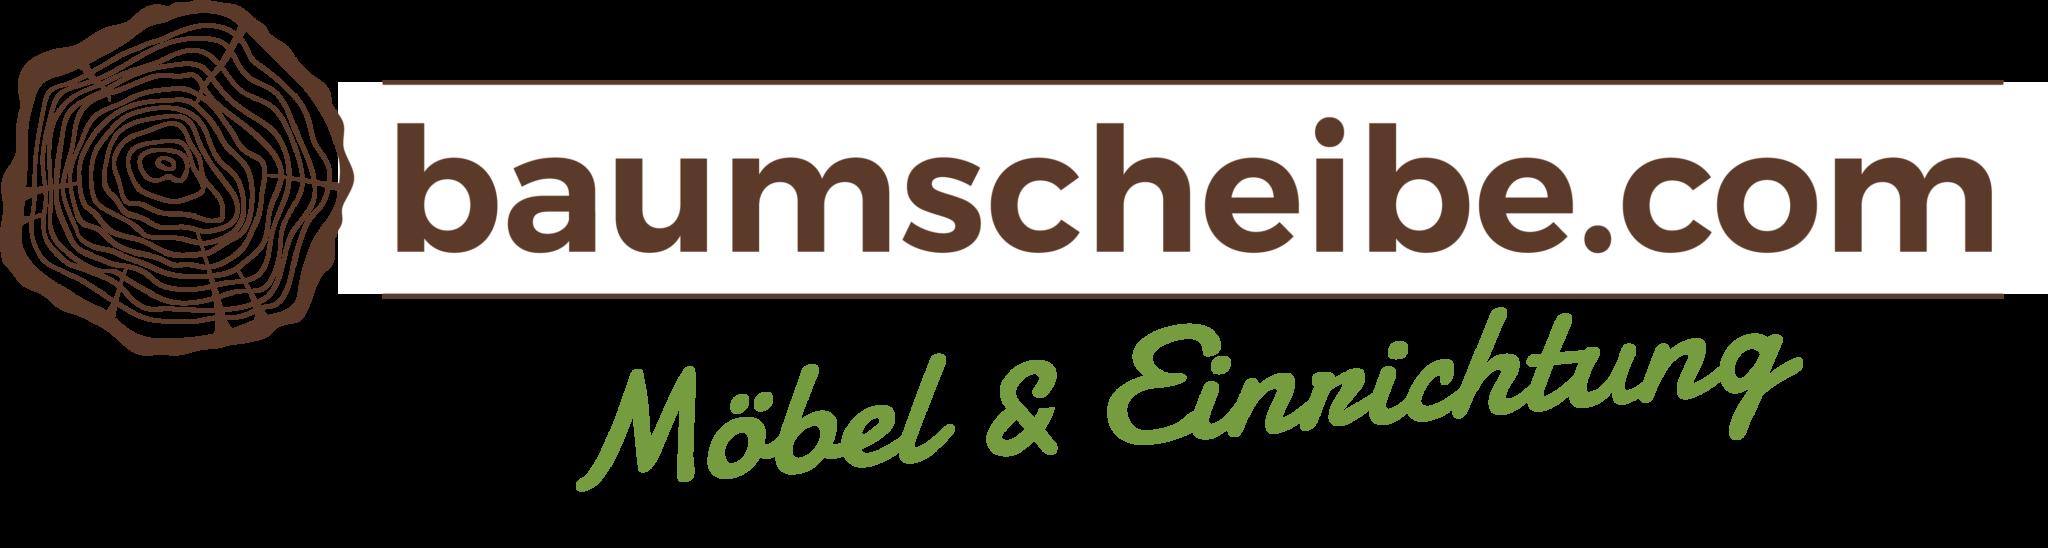 Baumscheibe.com